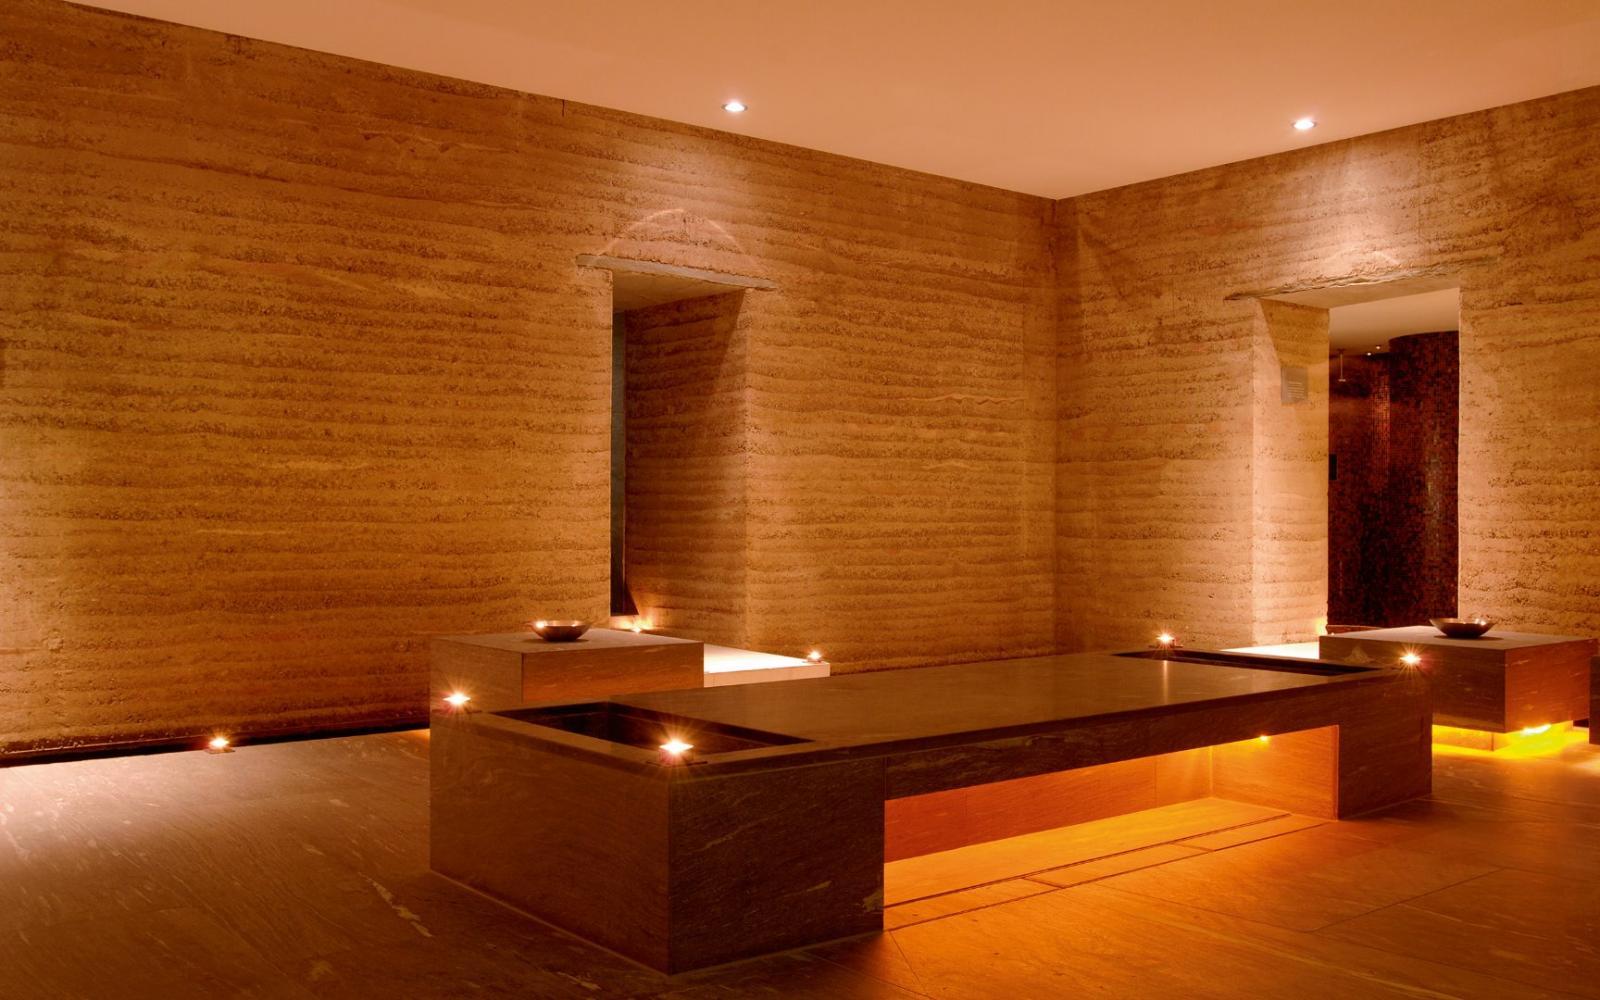 Waldhaus flims alpine grand hotel spa wellness spa for Hotel spa 13